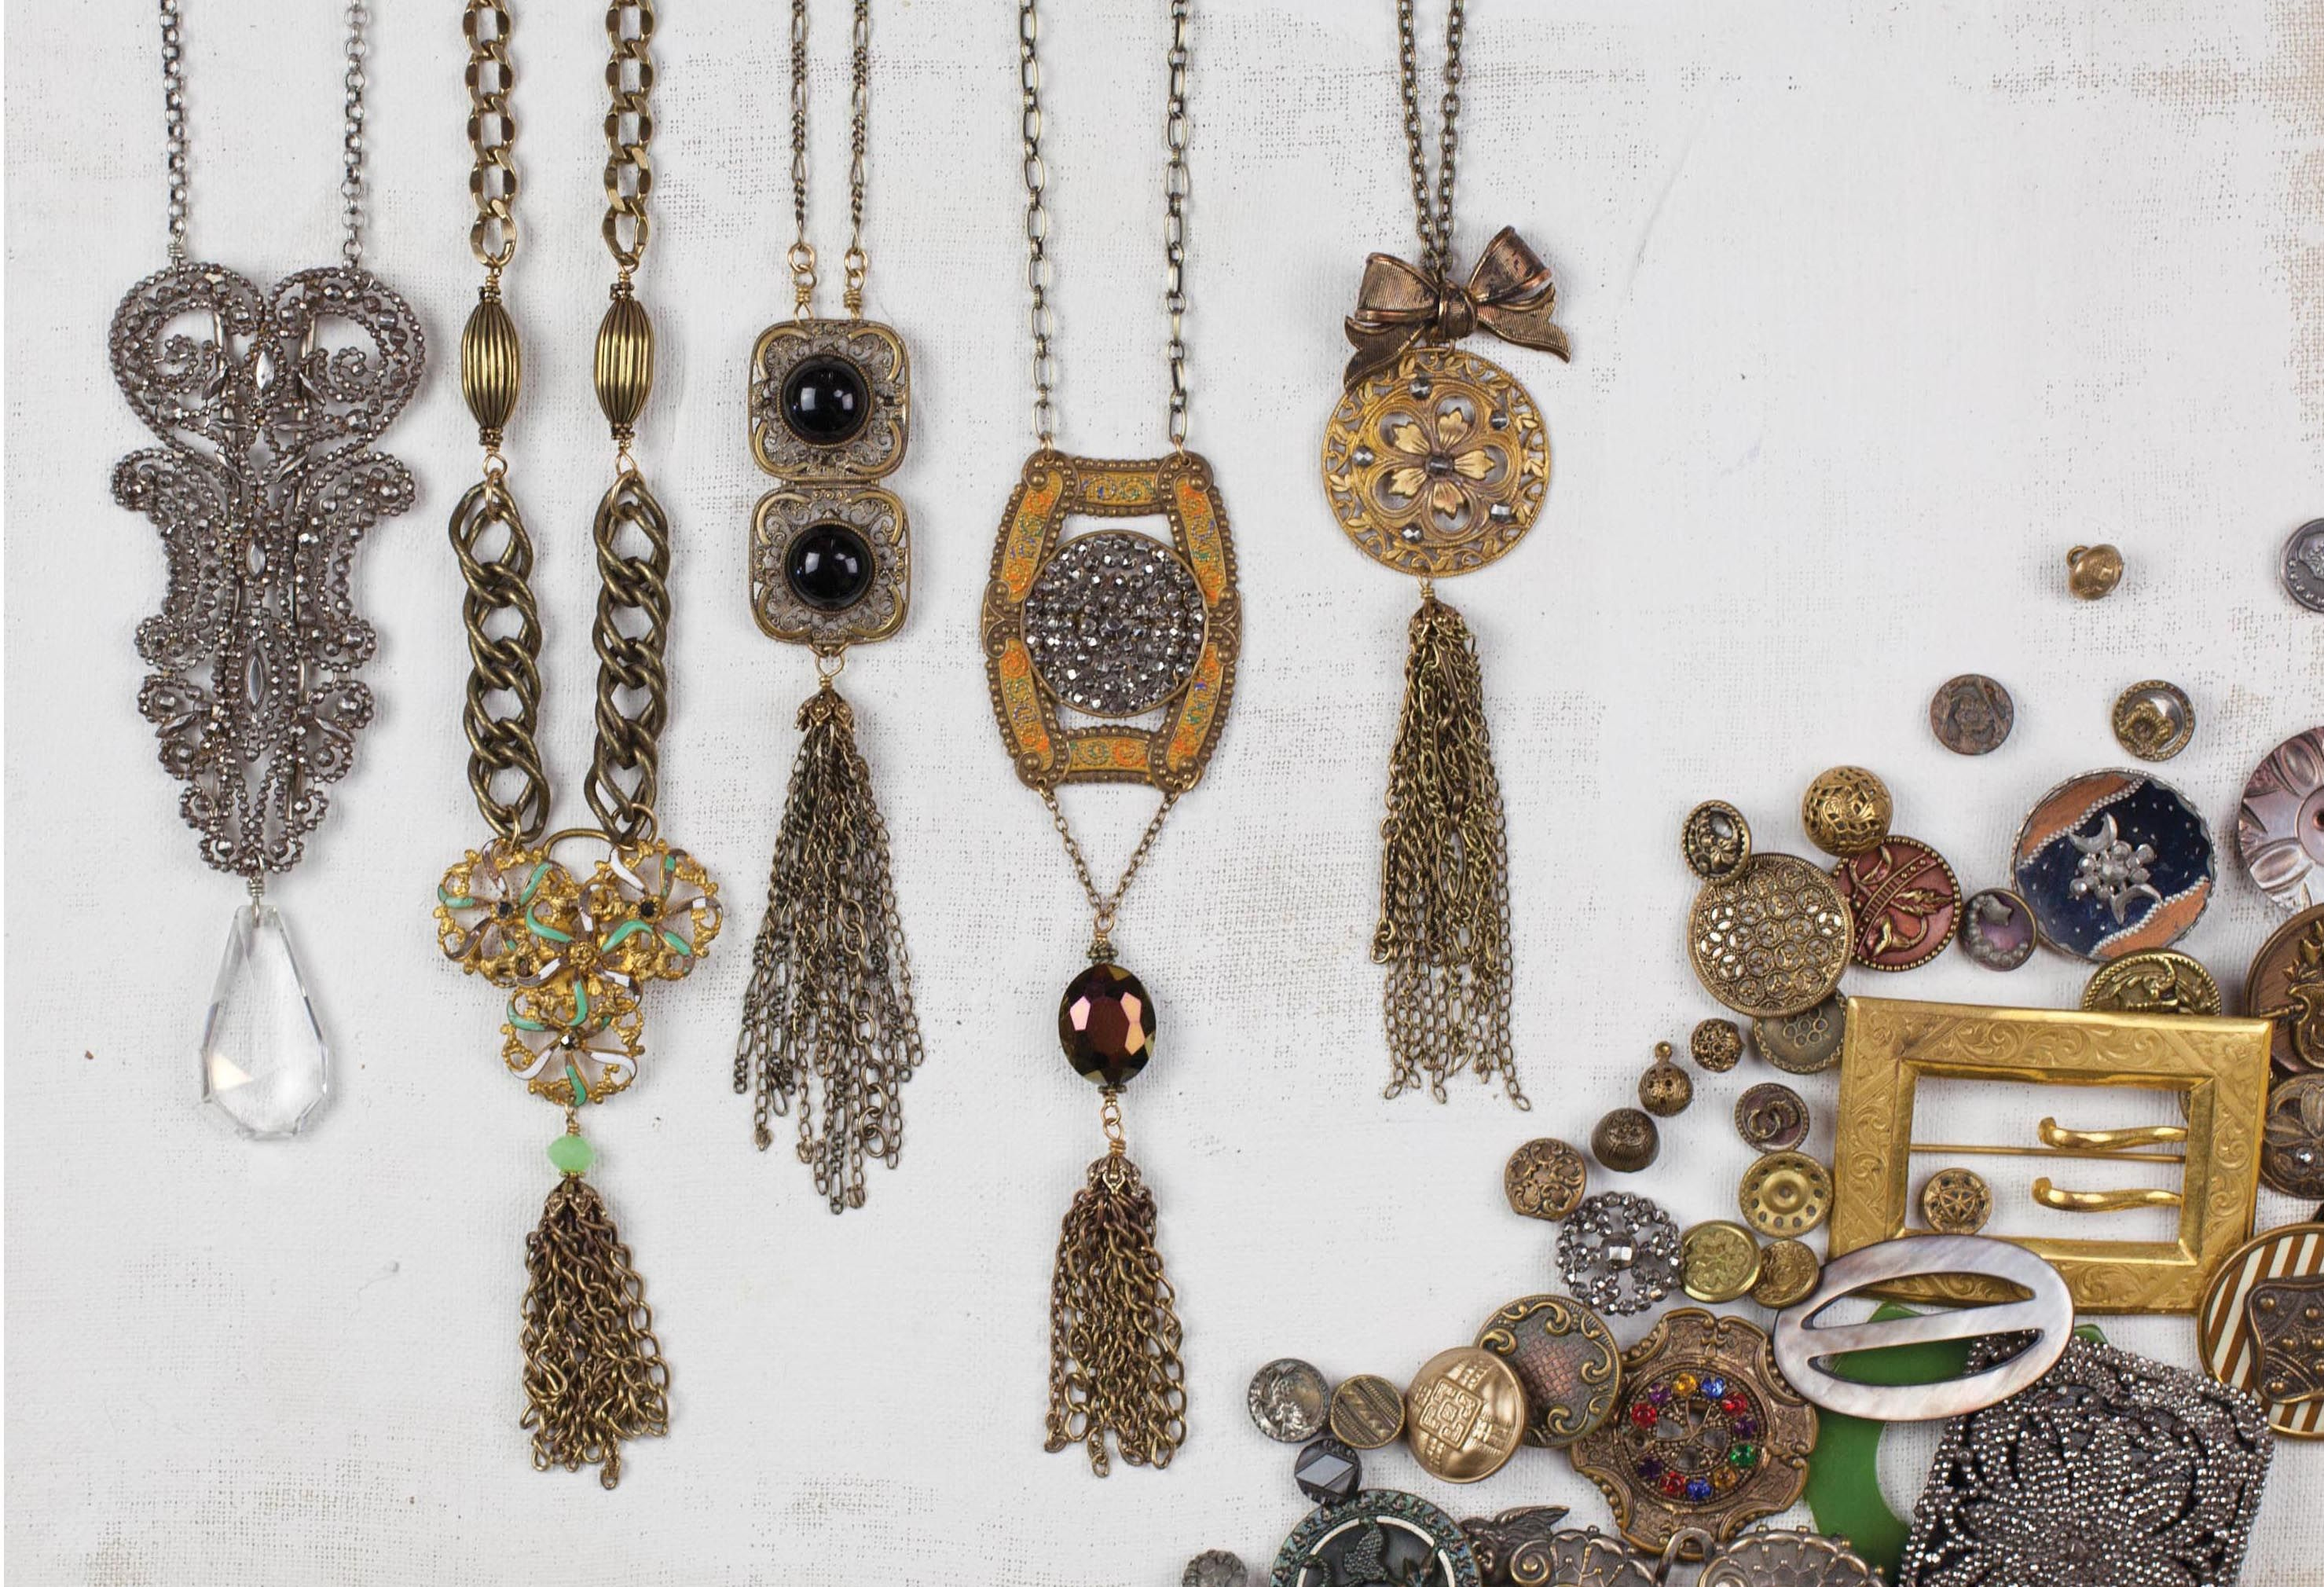 Grandmother's Buttons | Shop Online Antique and Vintage Button Jewelry | St. Francisville, LA